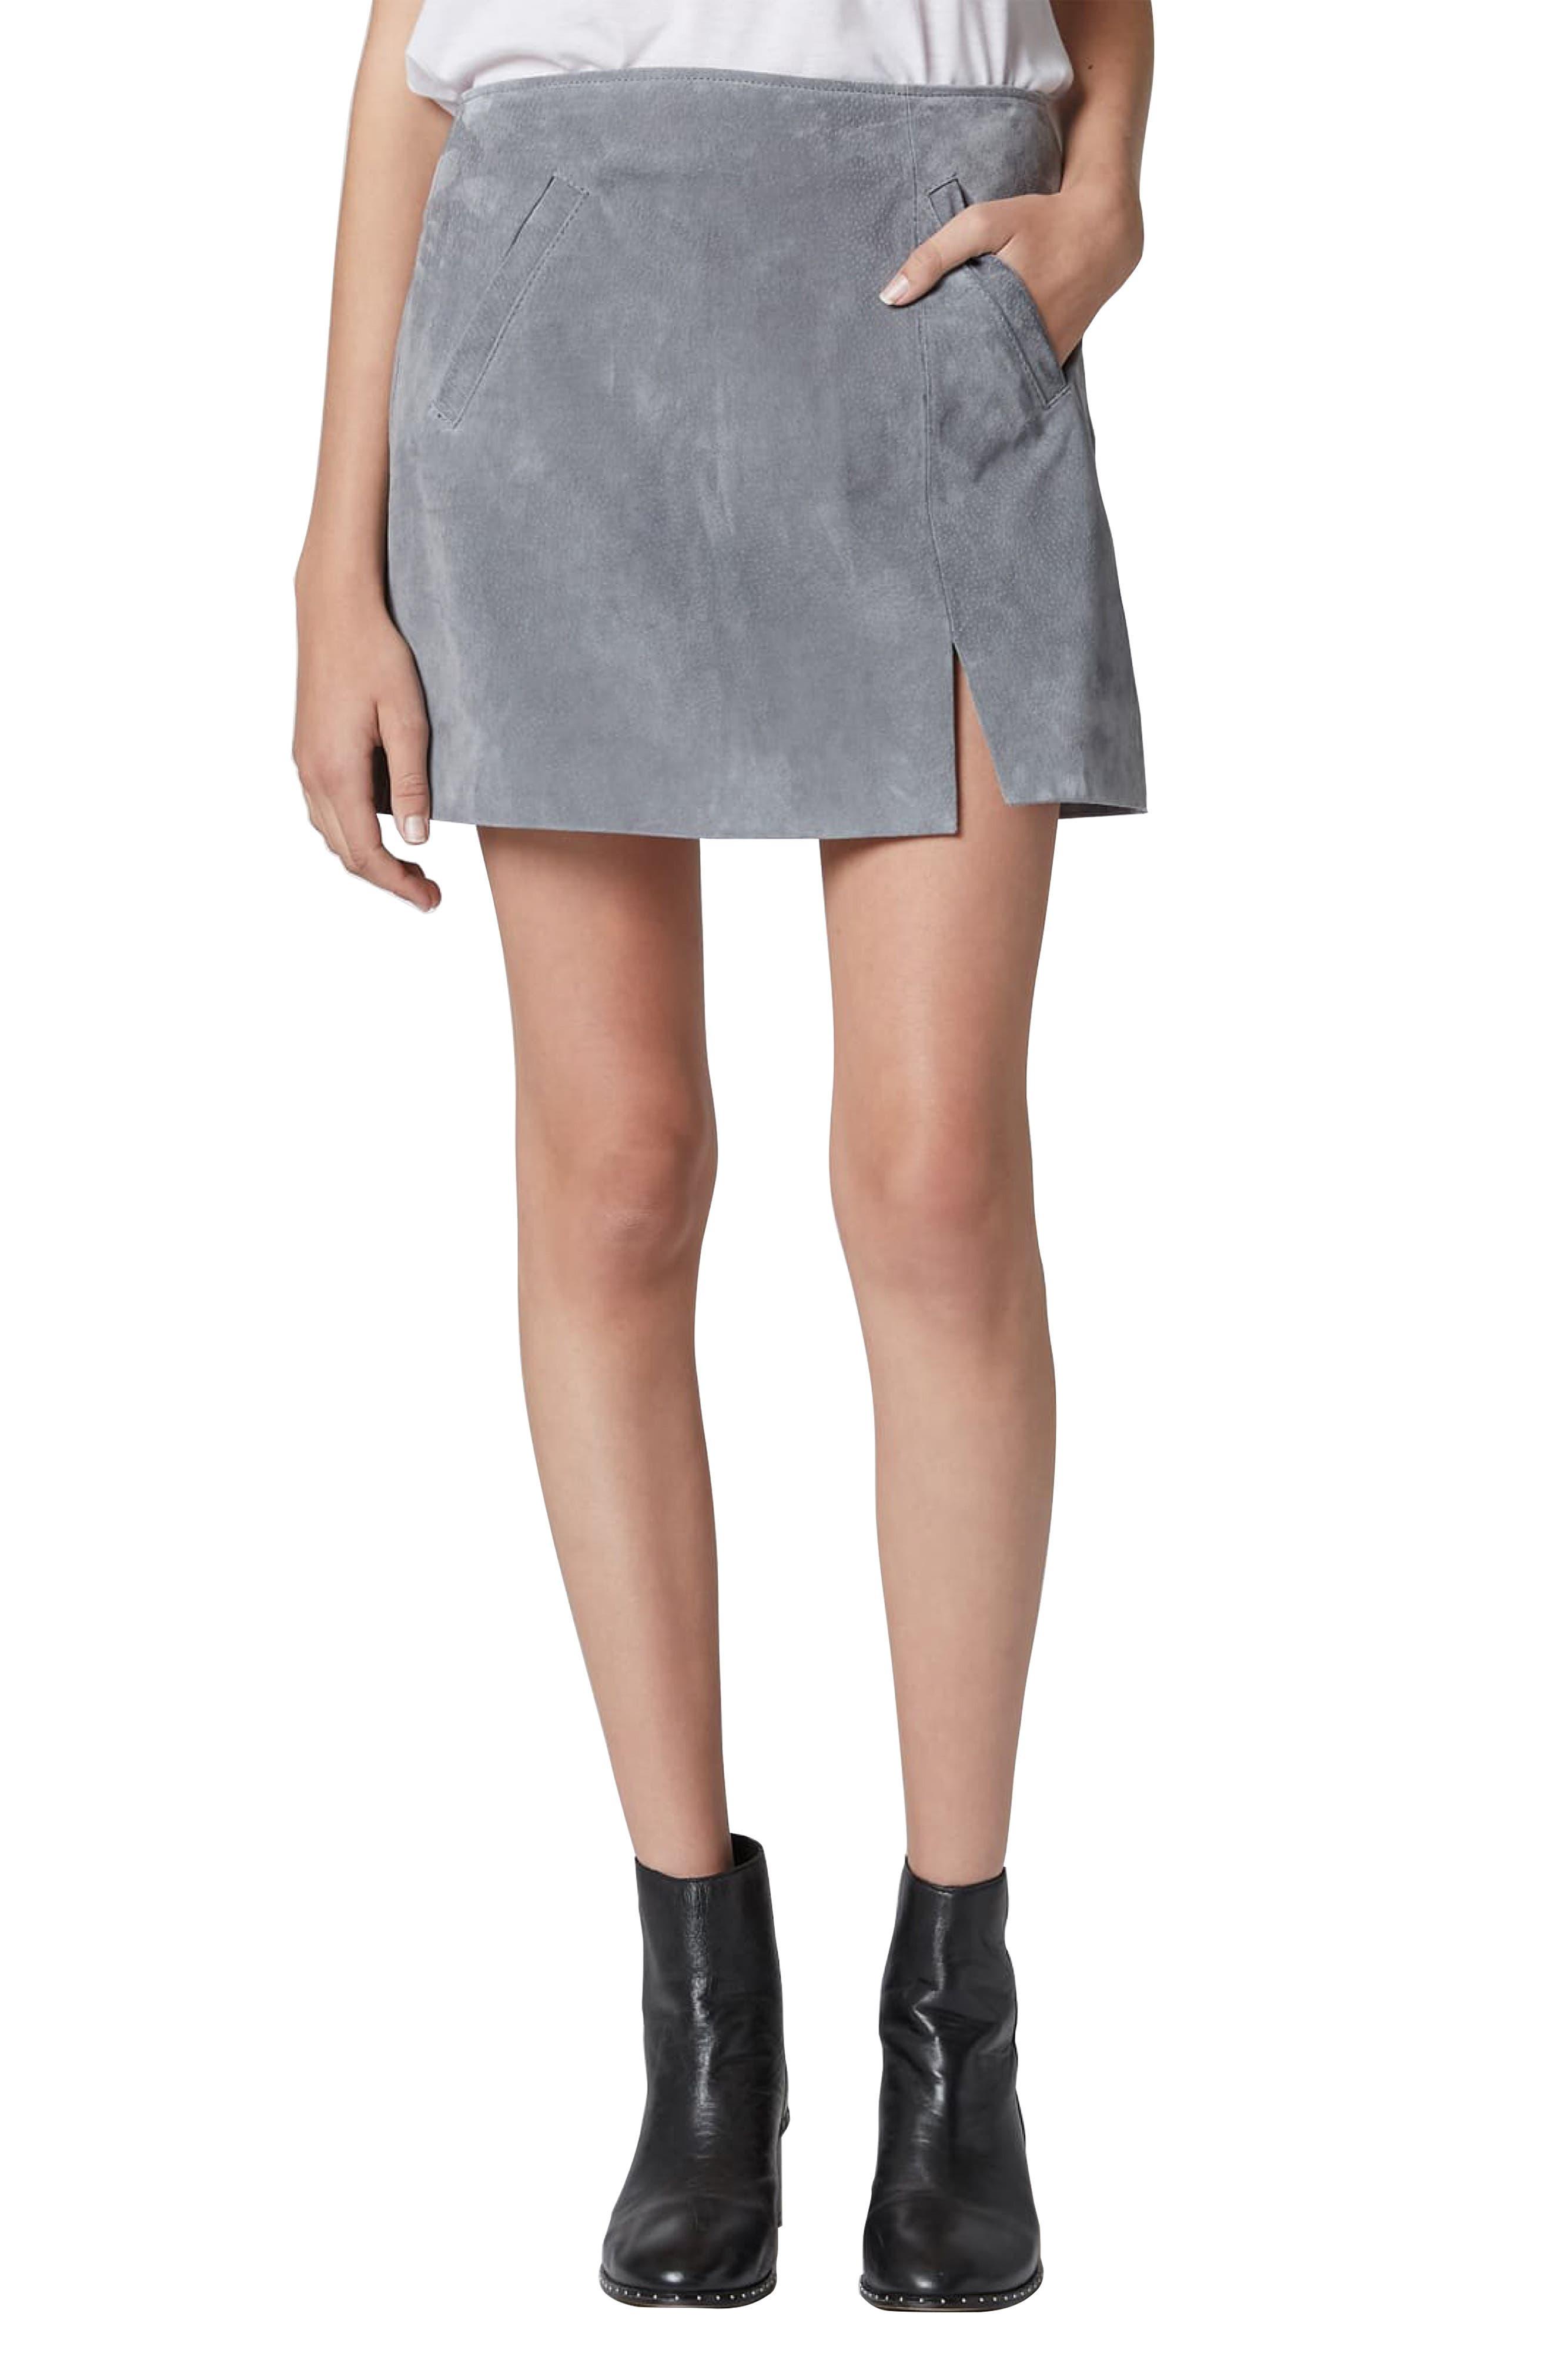 Blanknyc Suede Miniskirt, Grey